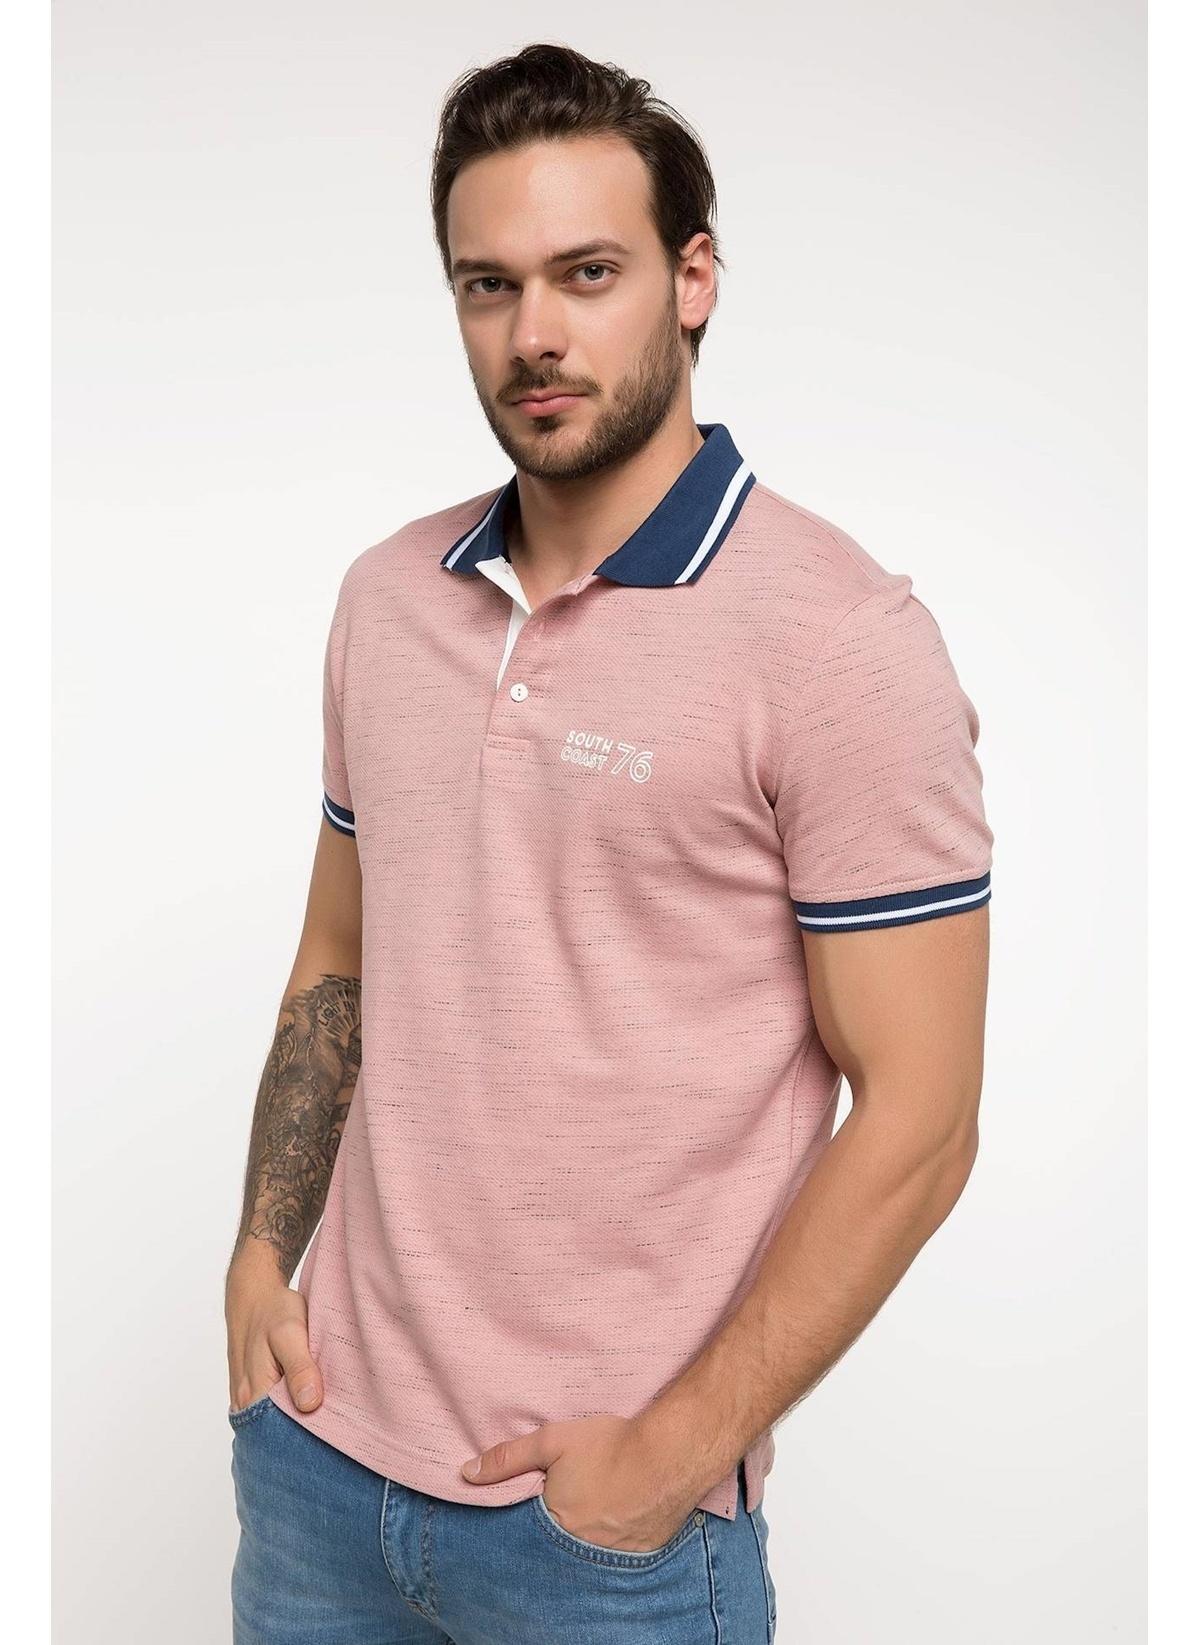 Defacto Tişört I6564az18smpn390t-shirt – 29.99 TL